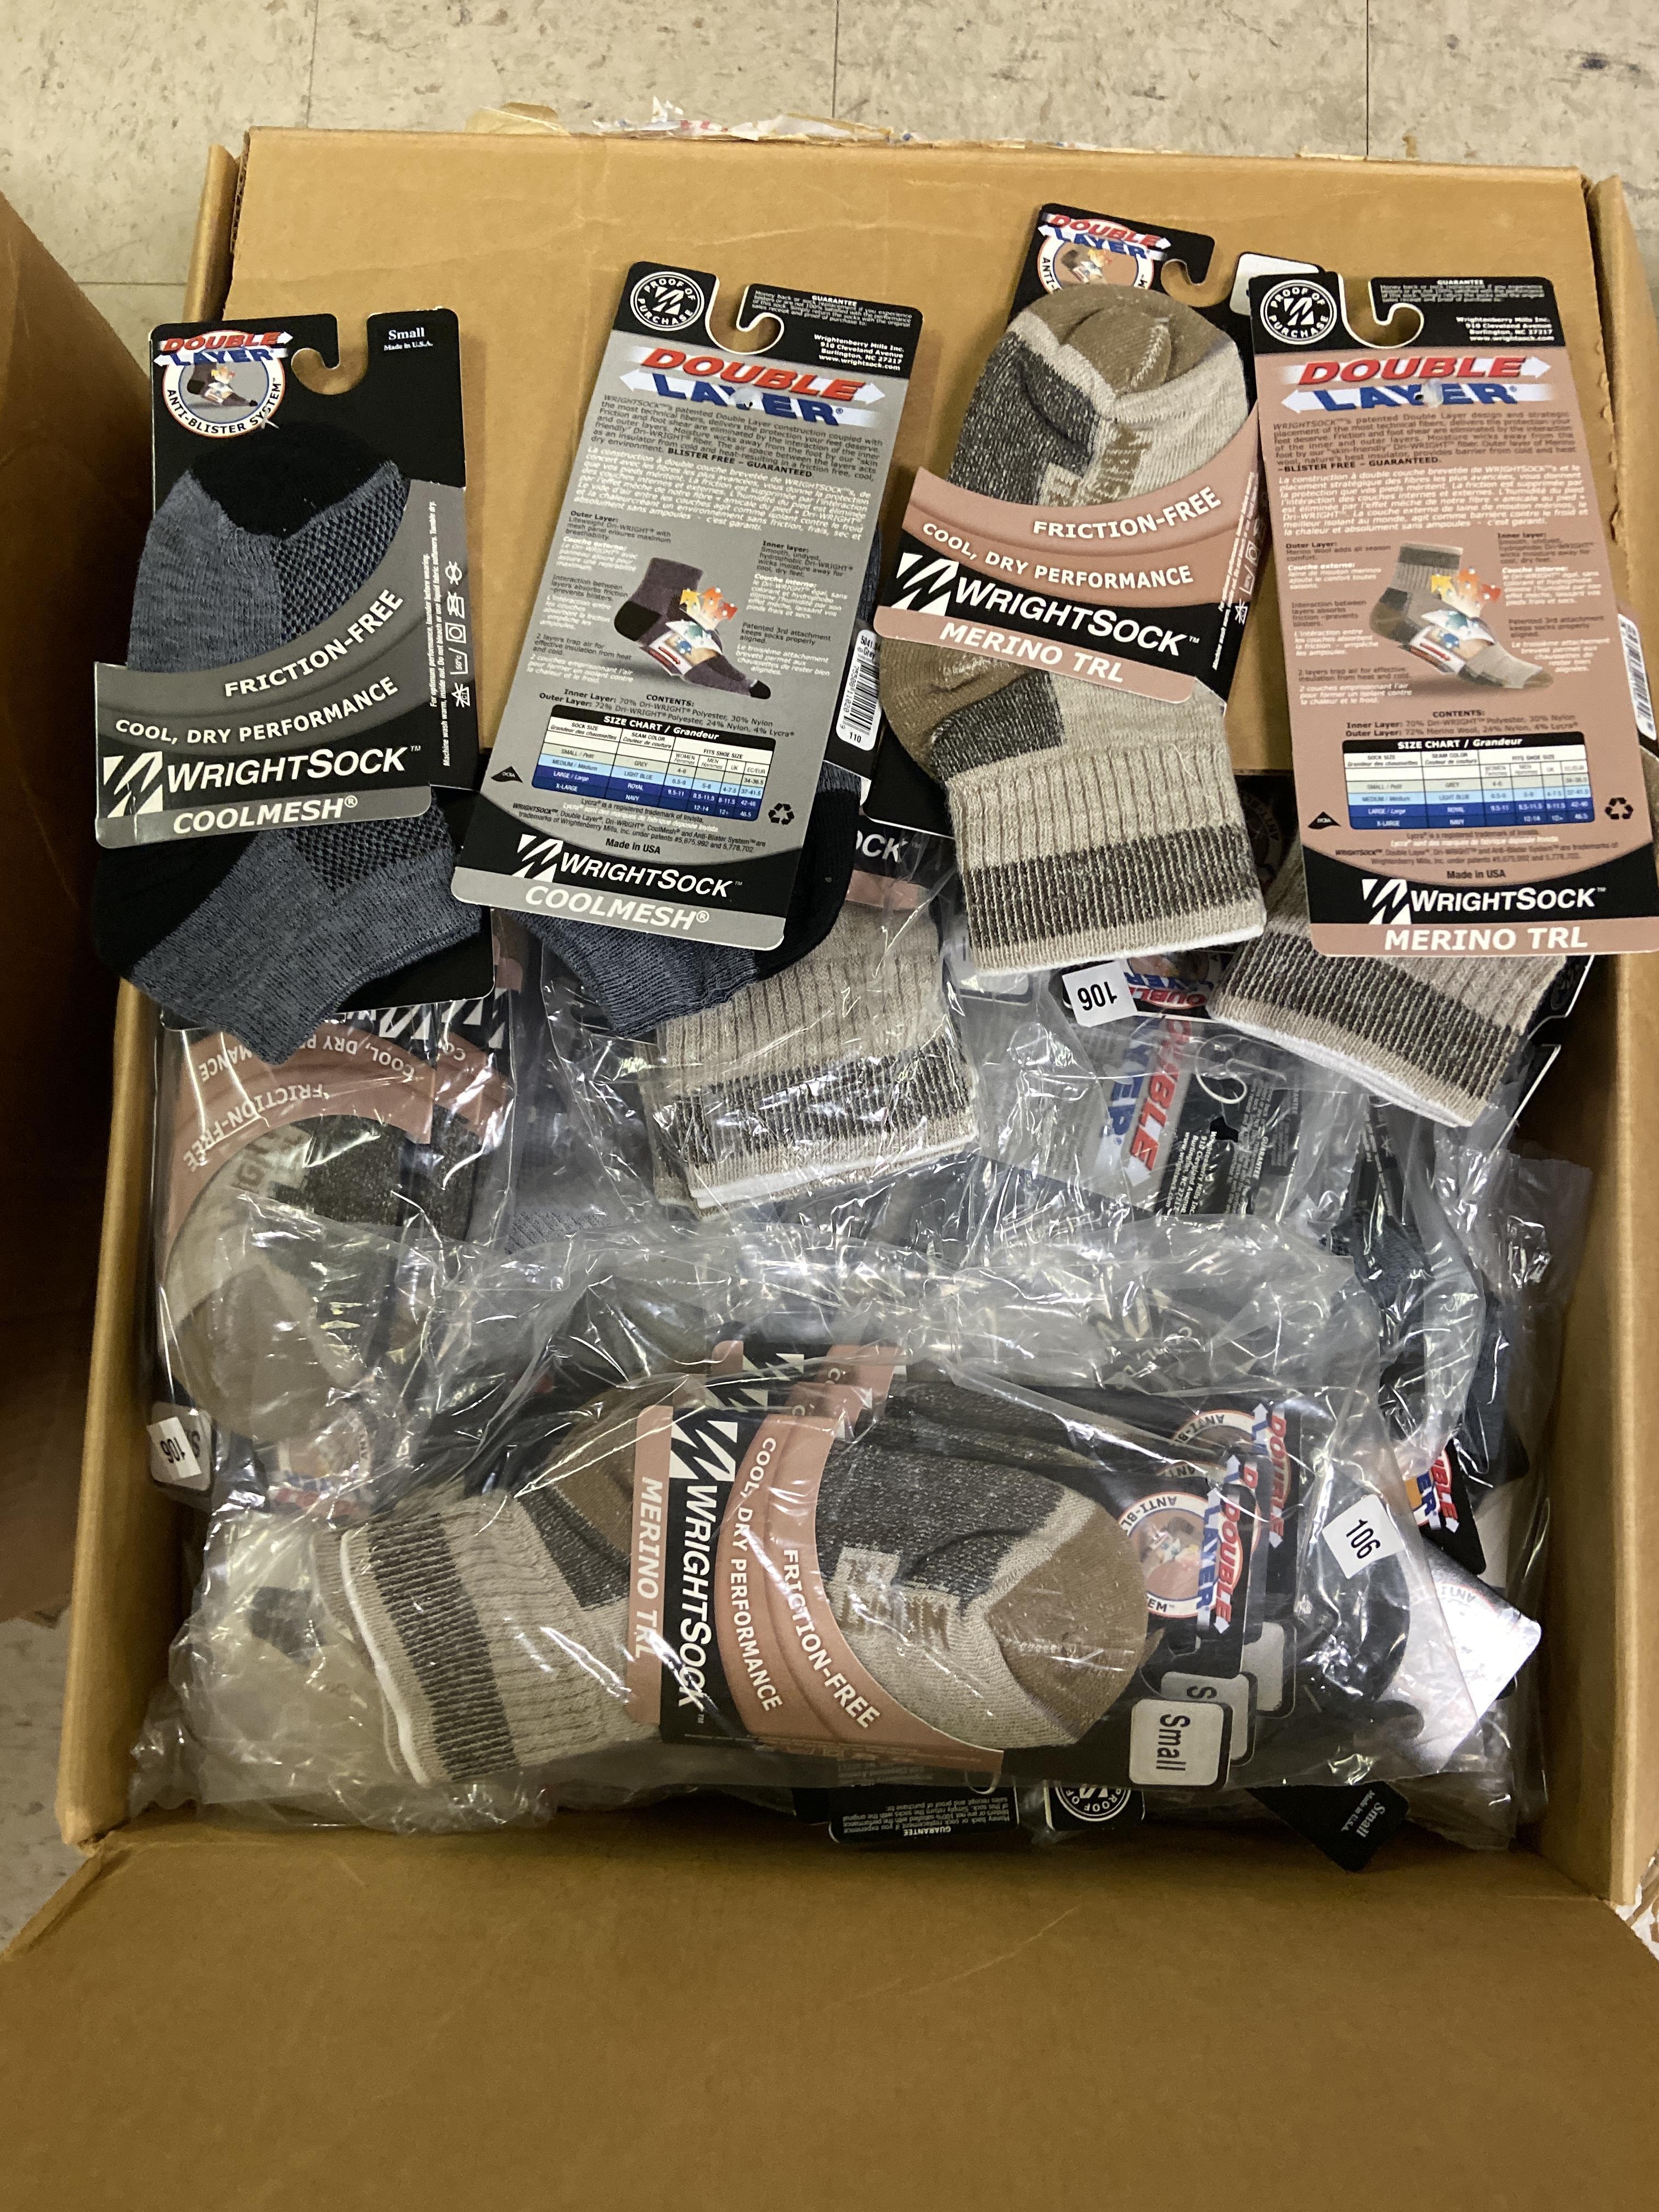 500+ packs of New Socks, Wrightsocks Various Styles, Various Colors - Image 2 of 6